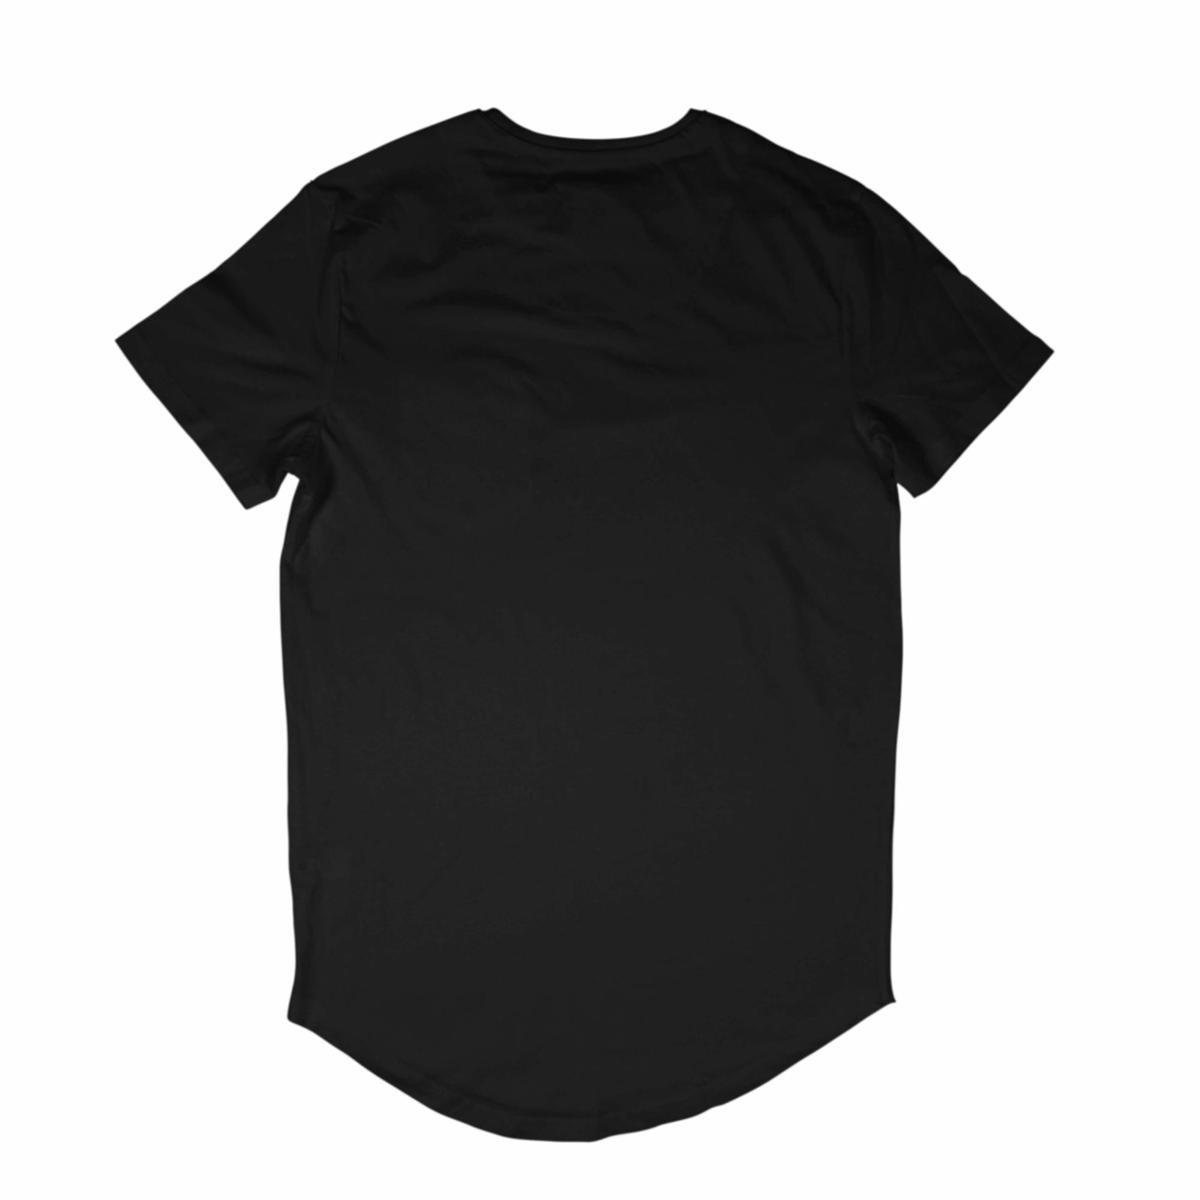 ... Camiseta Longline Long Beach California Palmeiras Sublimada Masculina 9223ac352a43b